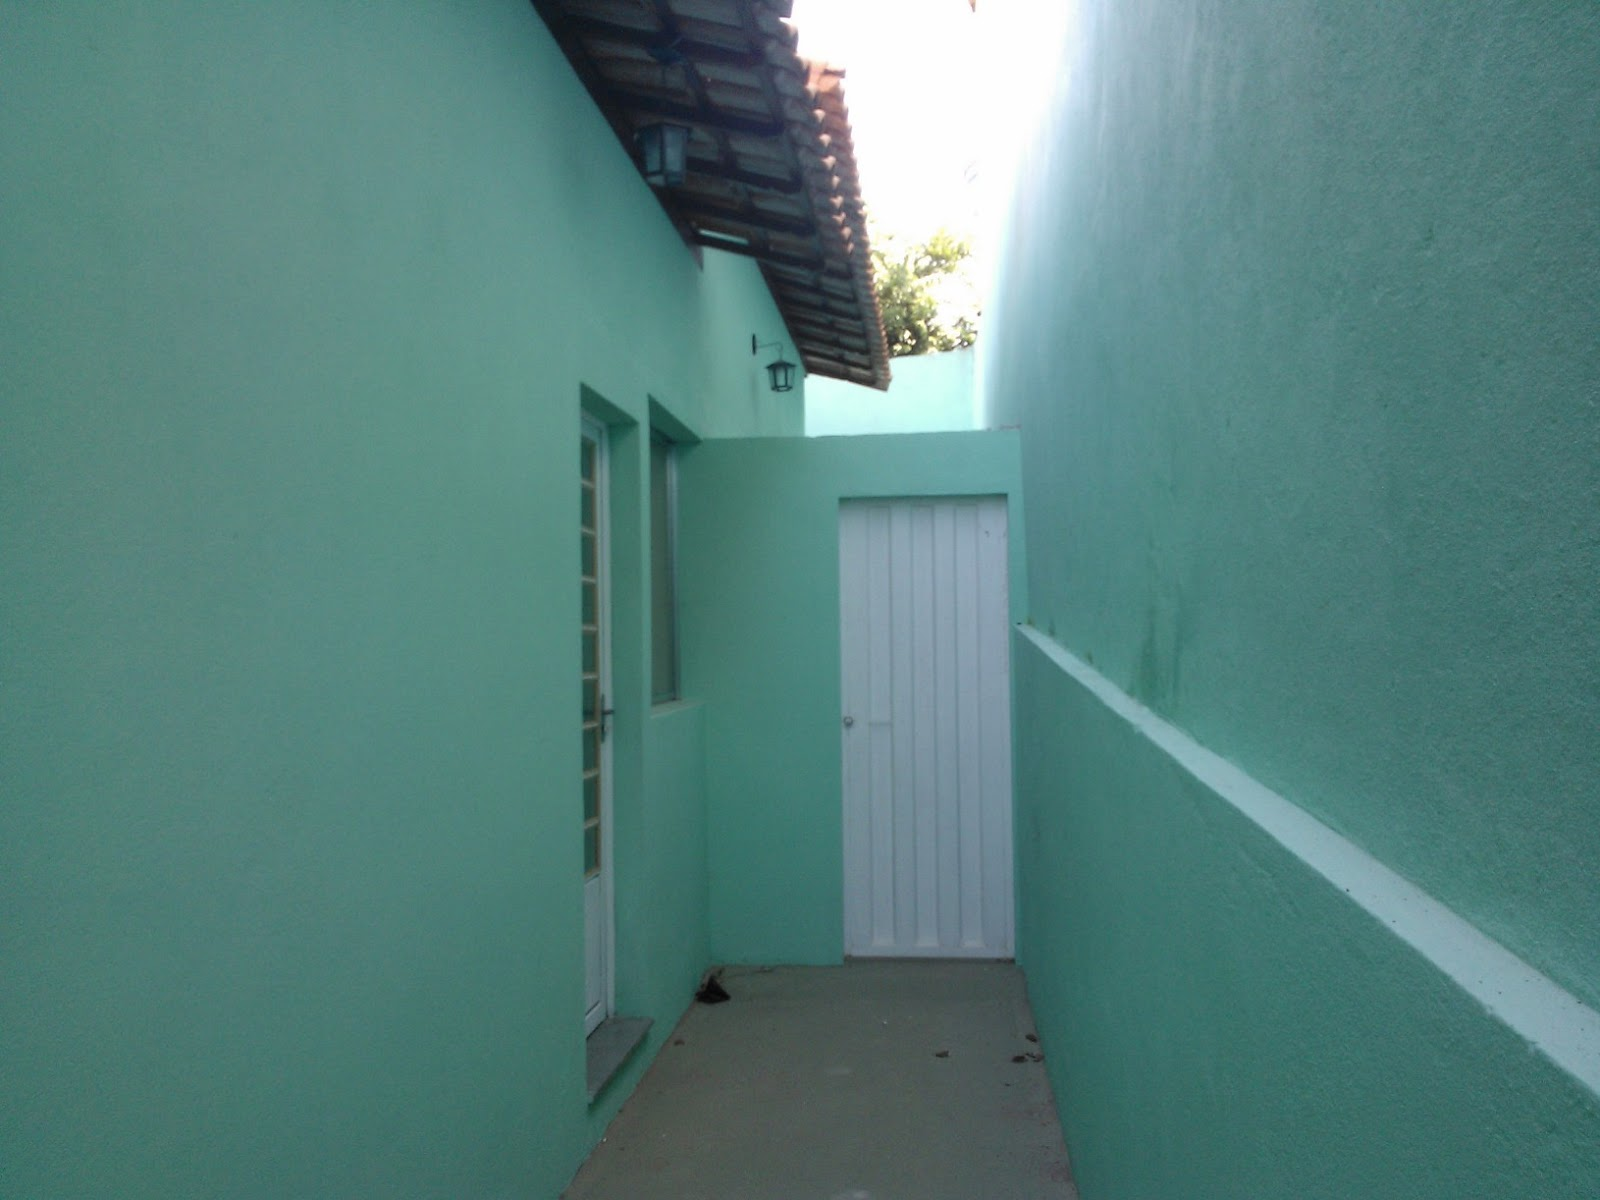 Rtn constru es for A ultima porta jejum coletivo